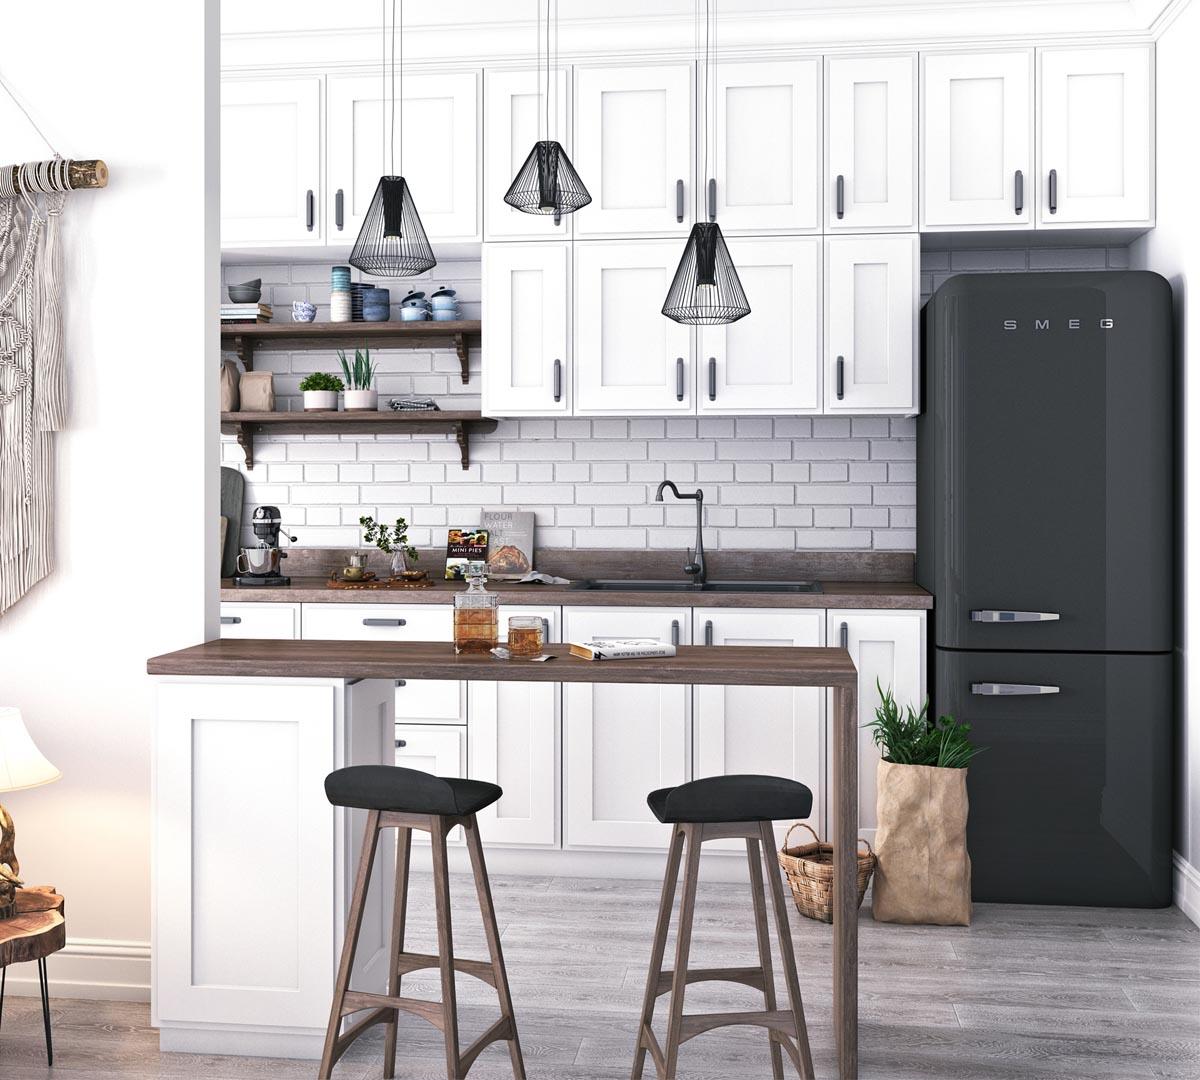 Black smeg fridge   Interior Design Ideas